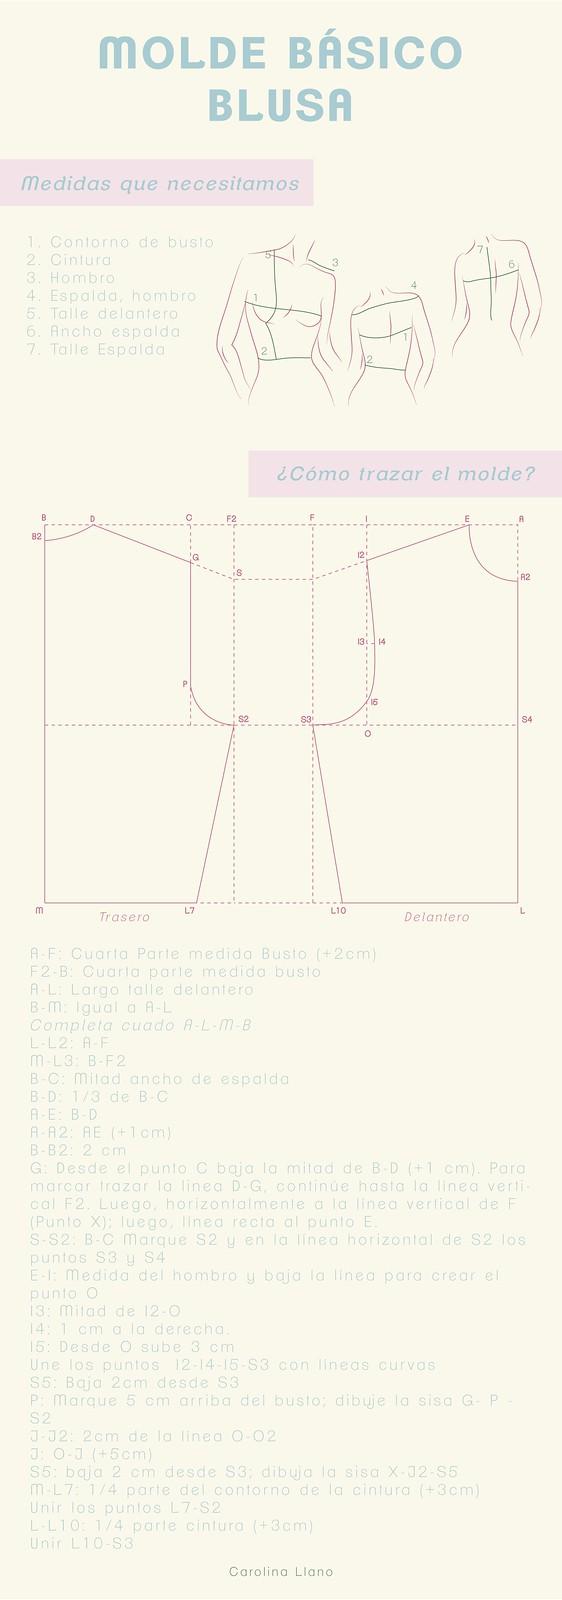 Molde basico blusa RGB-01